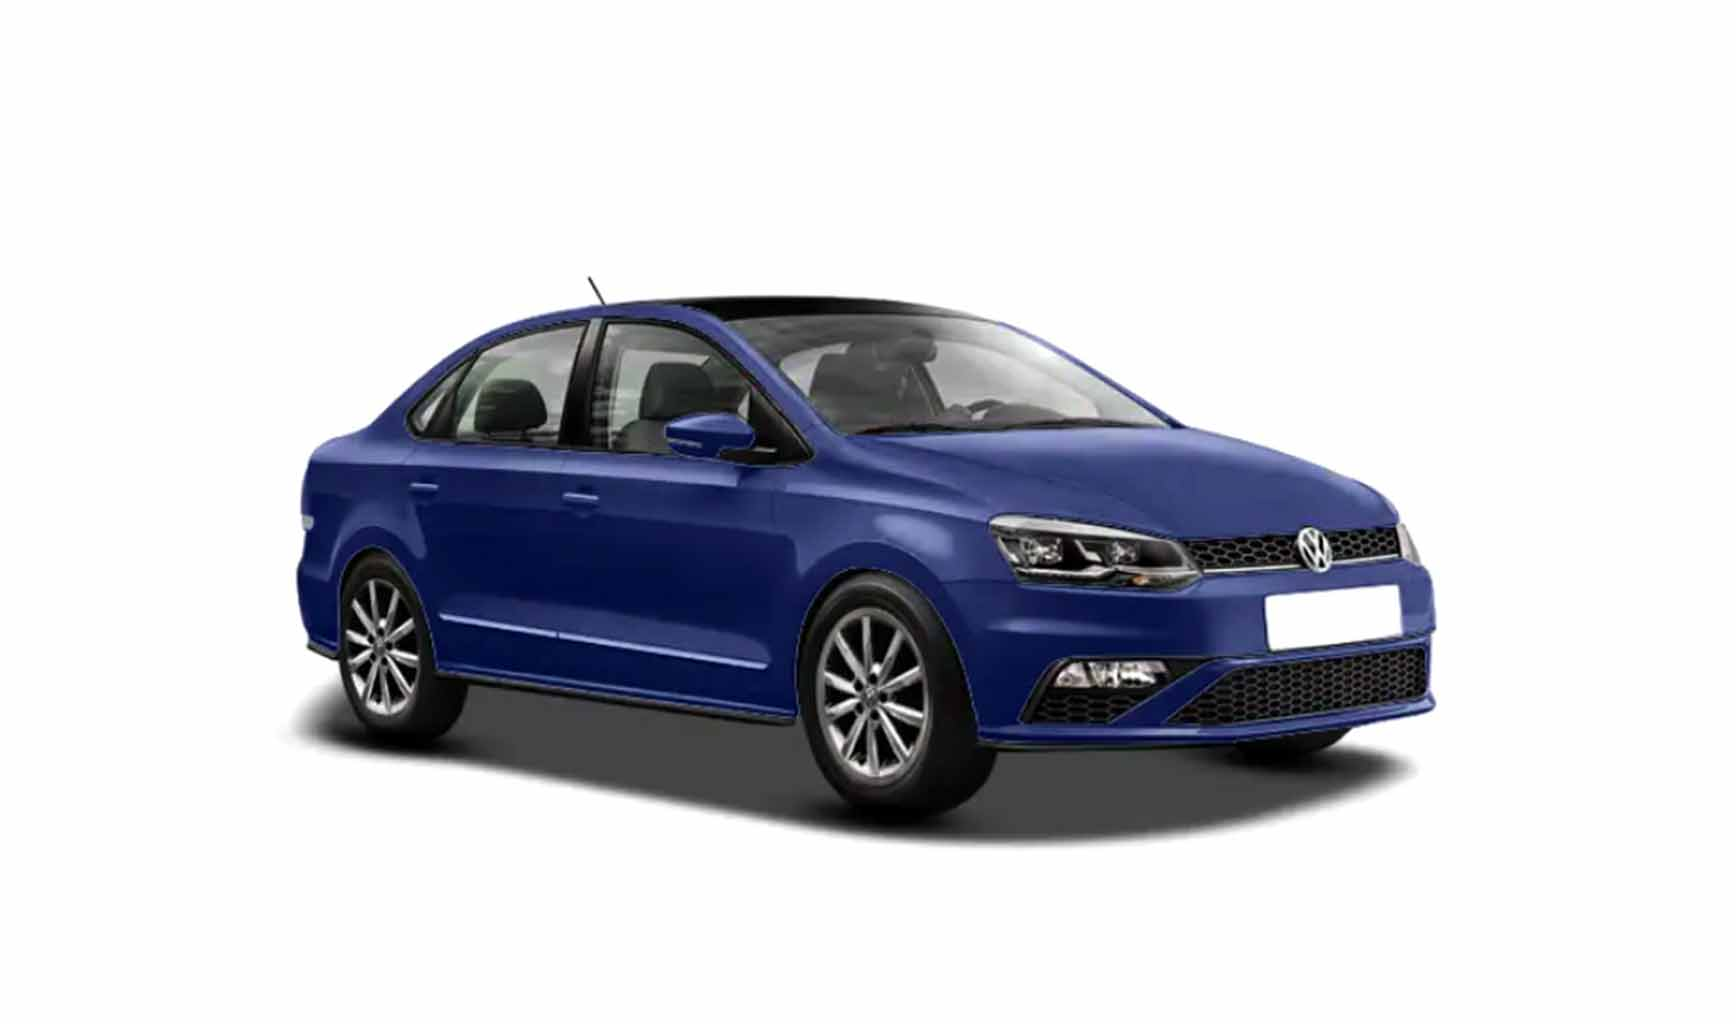 volkswagen-new-vento-lease-india-2021